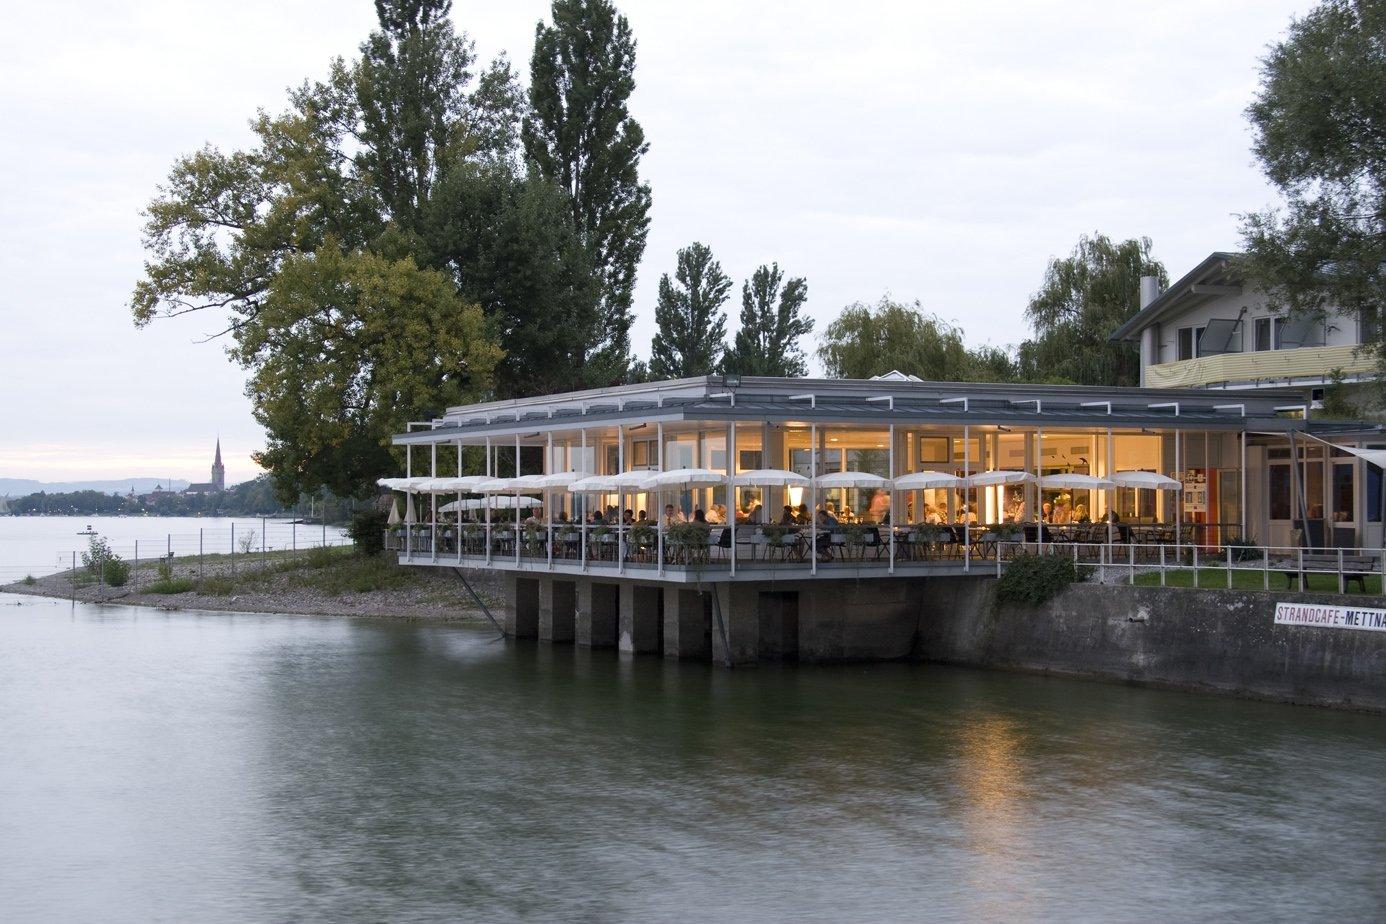 Restaurant Strandcafé Mettnau